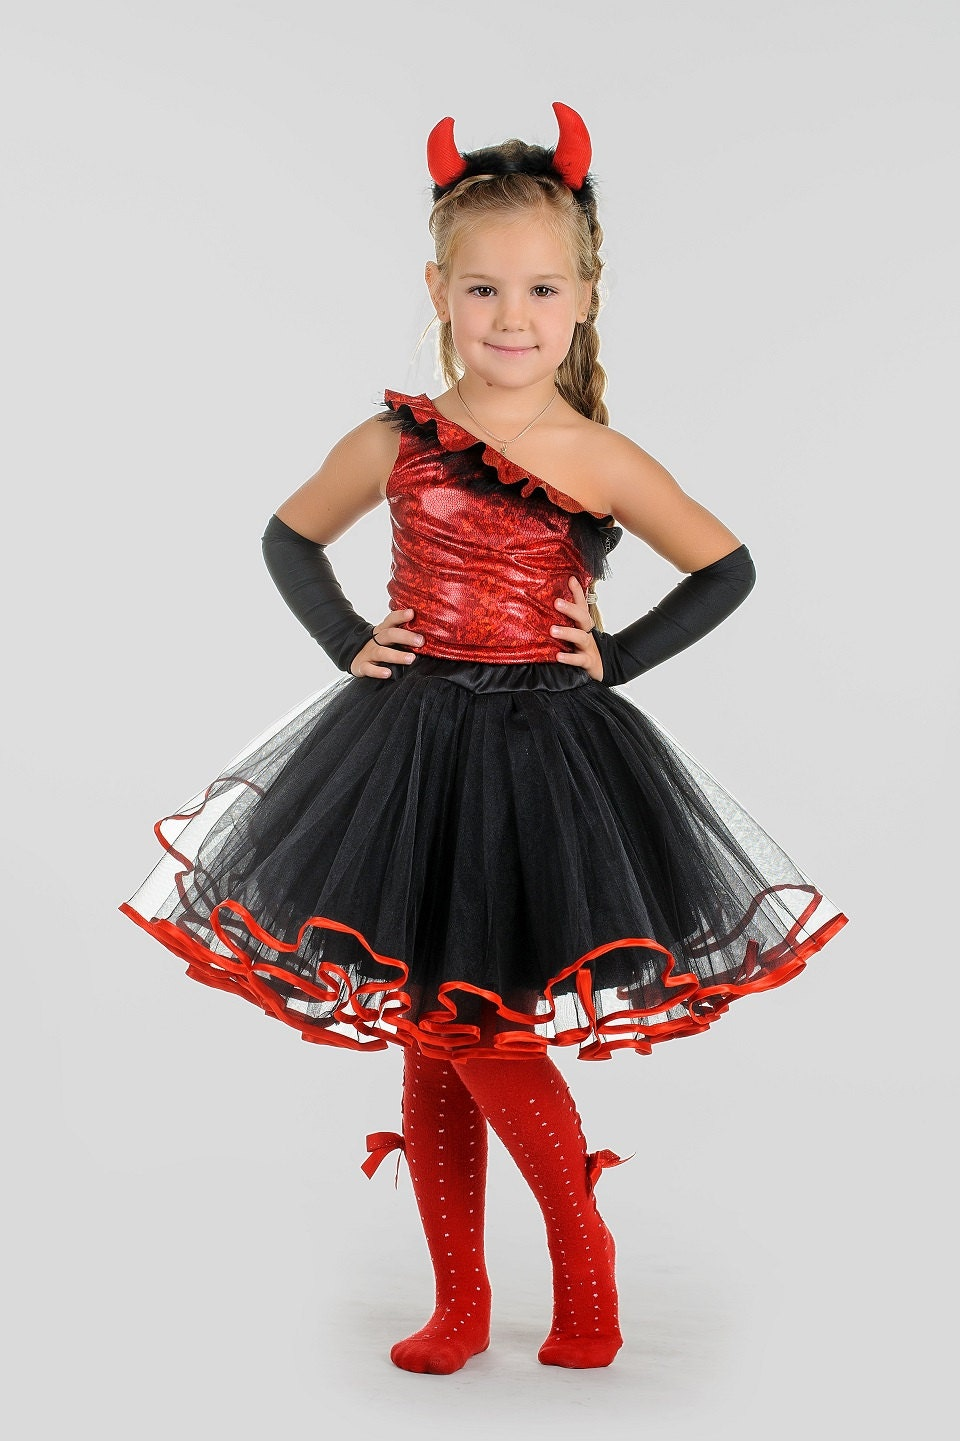 424Костюм на хэллоуин для девочки 7 лет